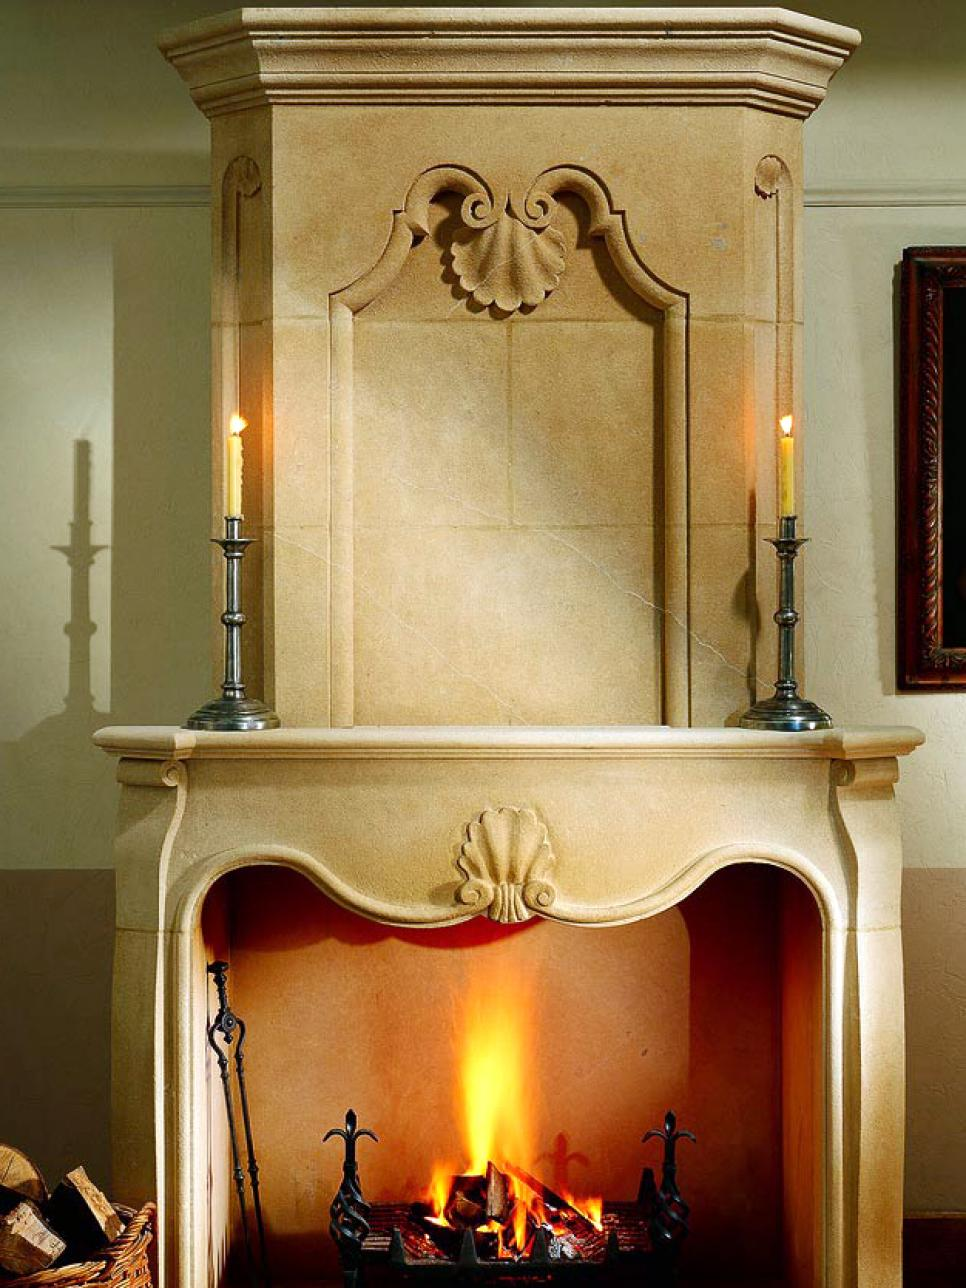 Fiery Fireplace Candles HGTV